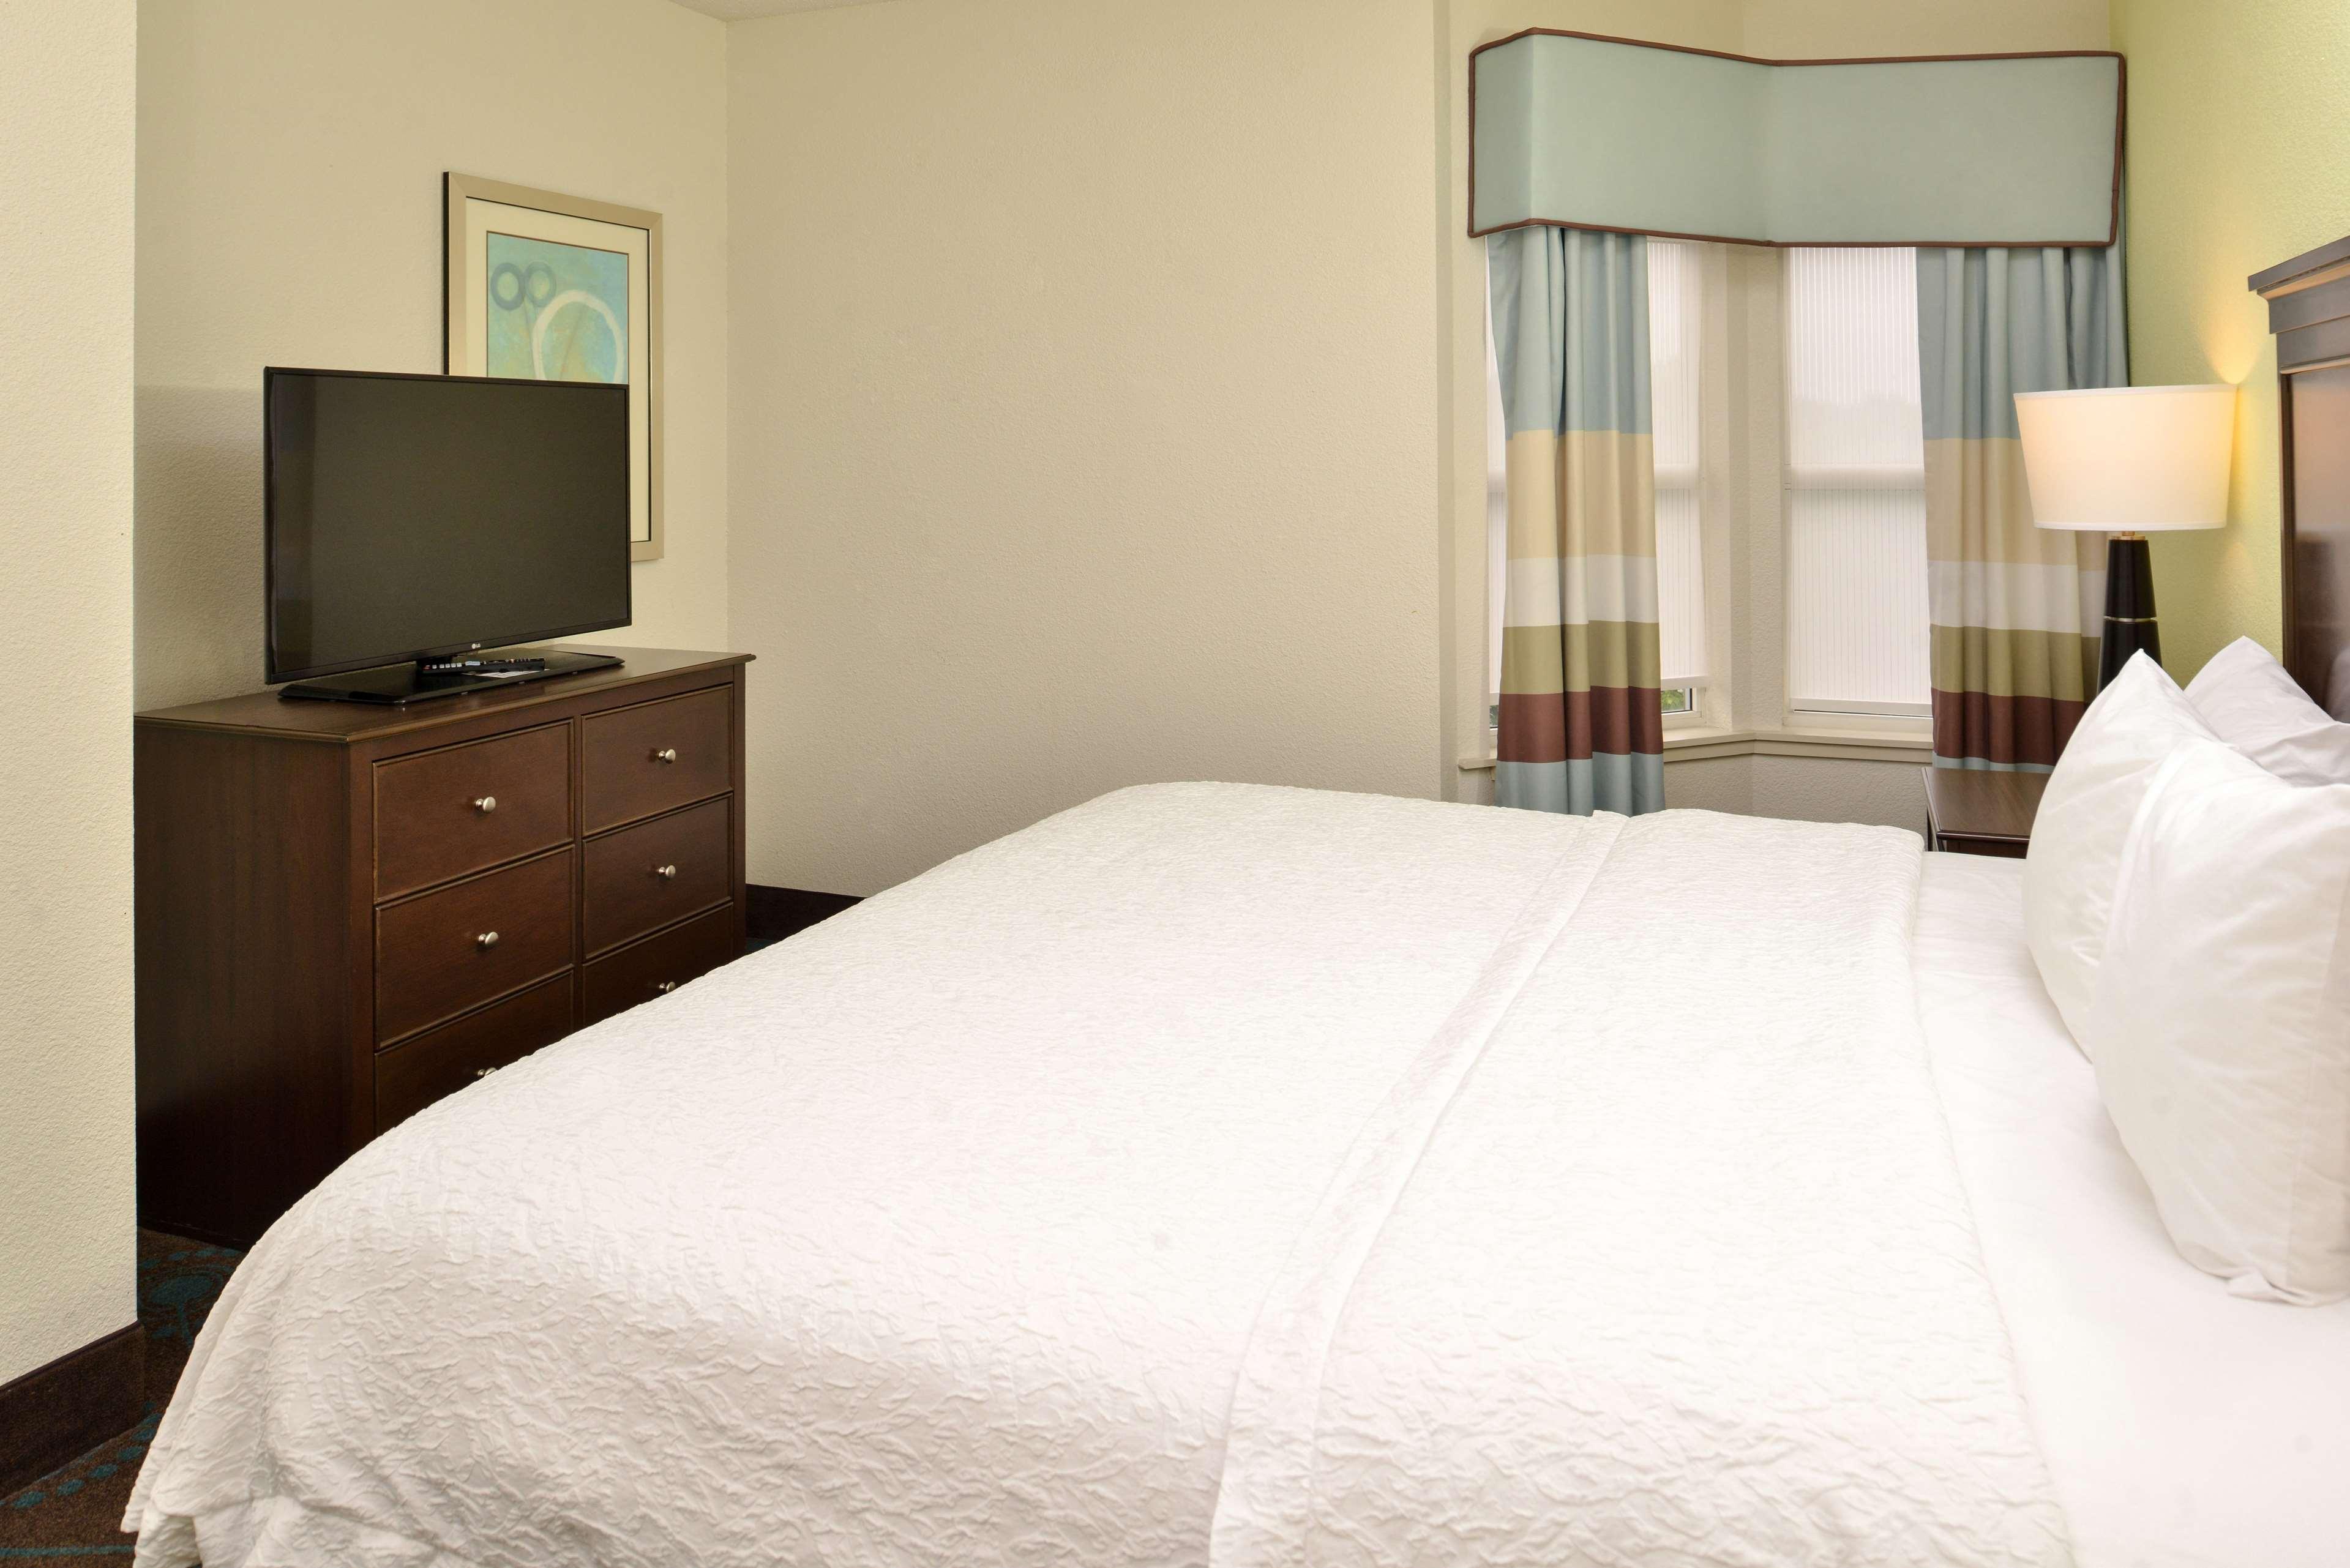 Hampton Inn & Suites Newport News (Oyster Point) image 29